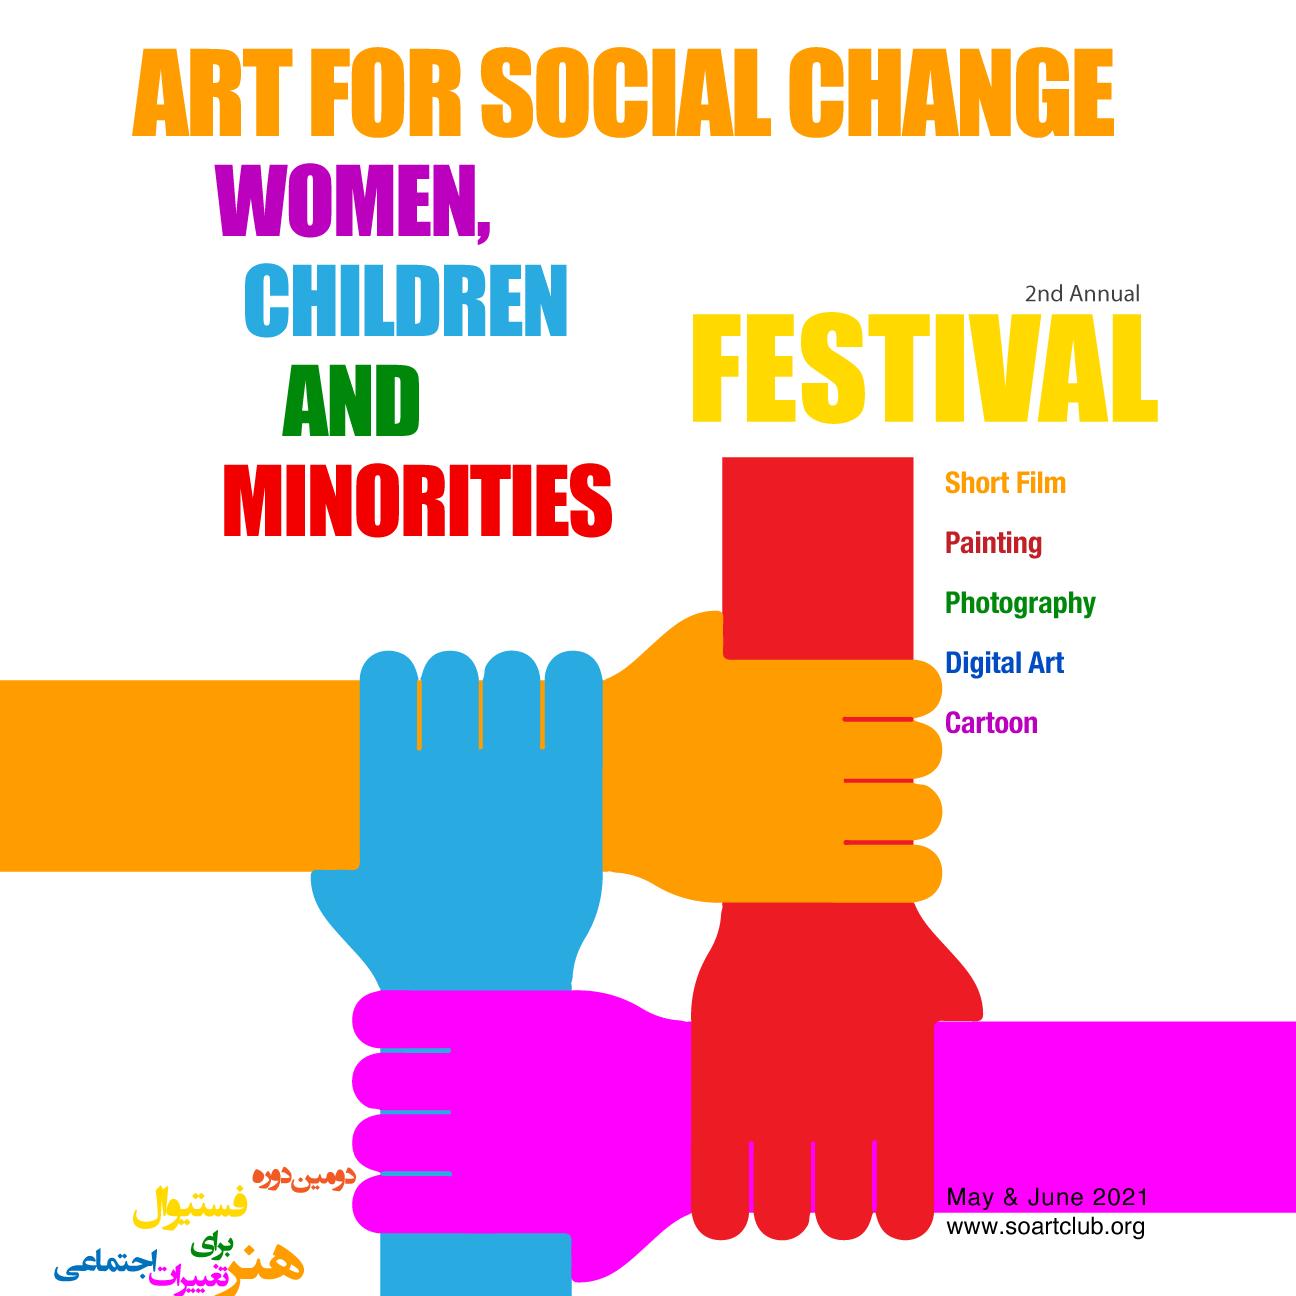 ۲nd-Poster-festival-2-squre